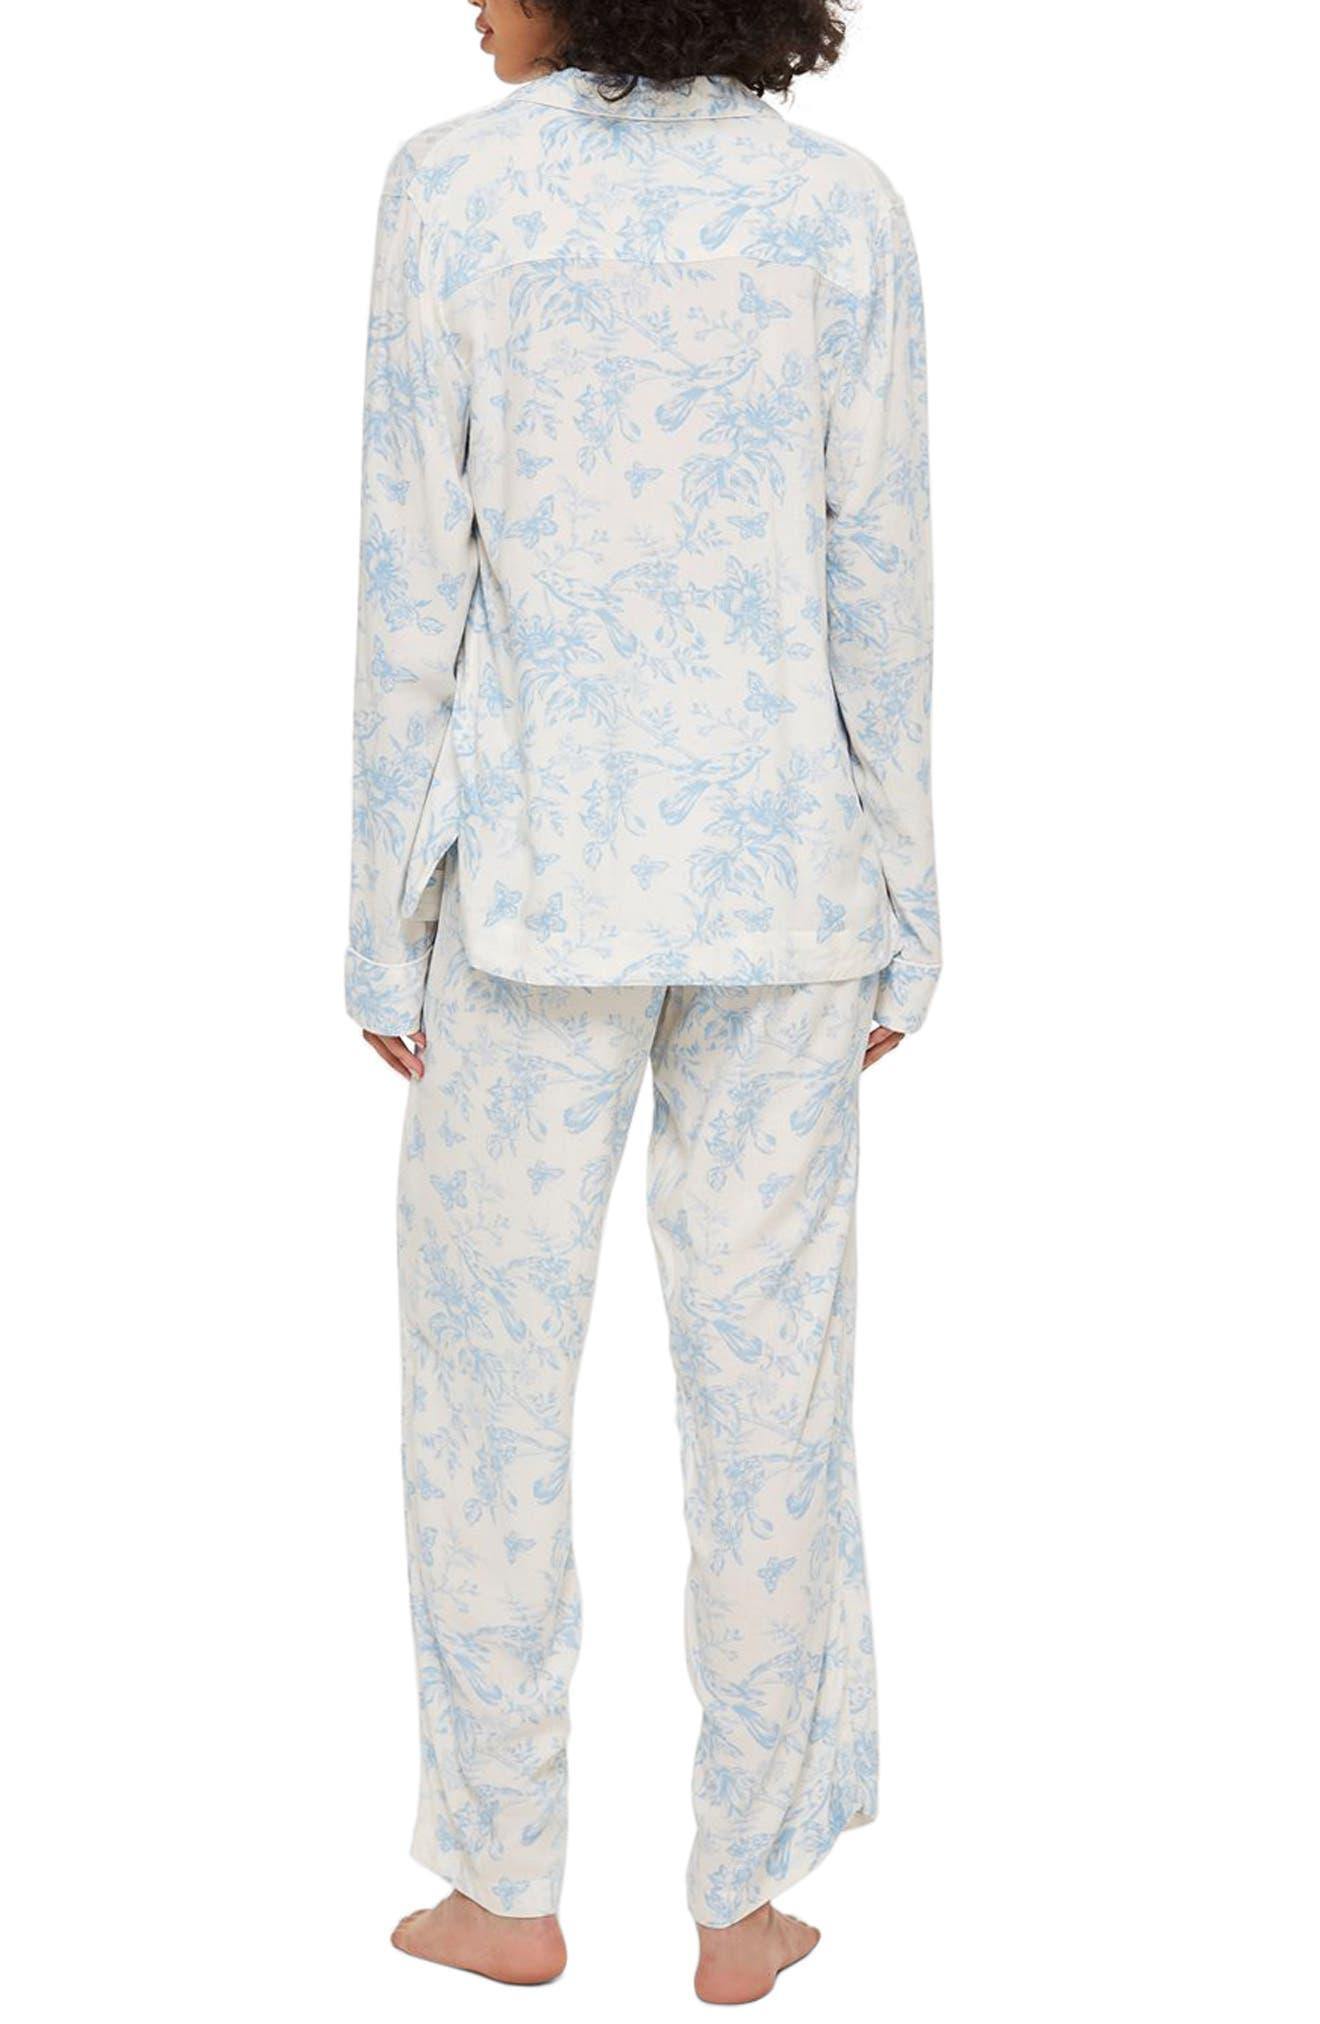 French Bird Pajamas,                             Alternate thumbnail 2, color,                             LIGHT BLUE